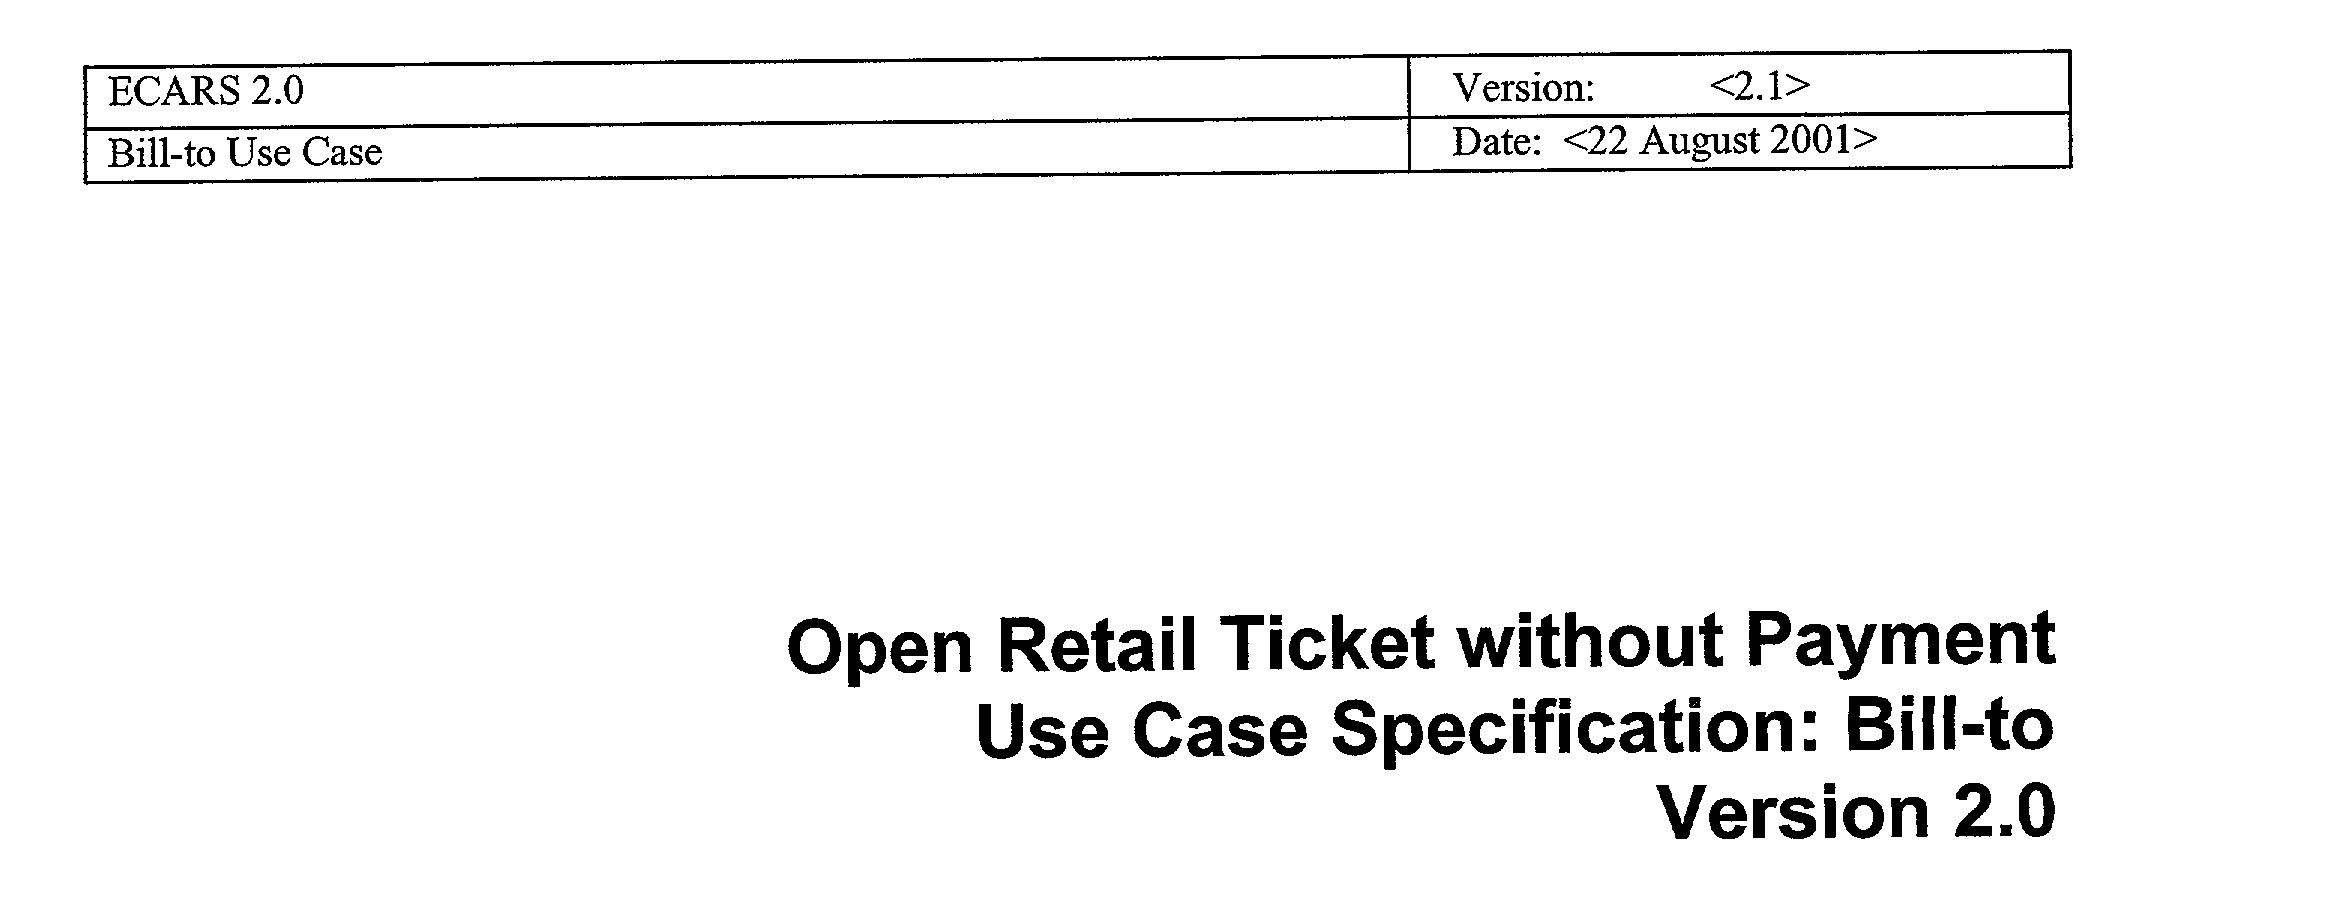 Figure US20030125992A1-20030703-P01833